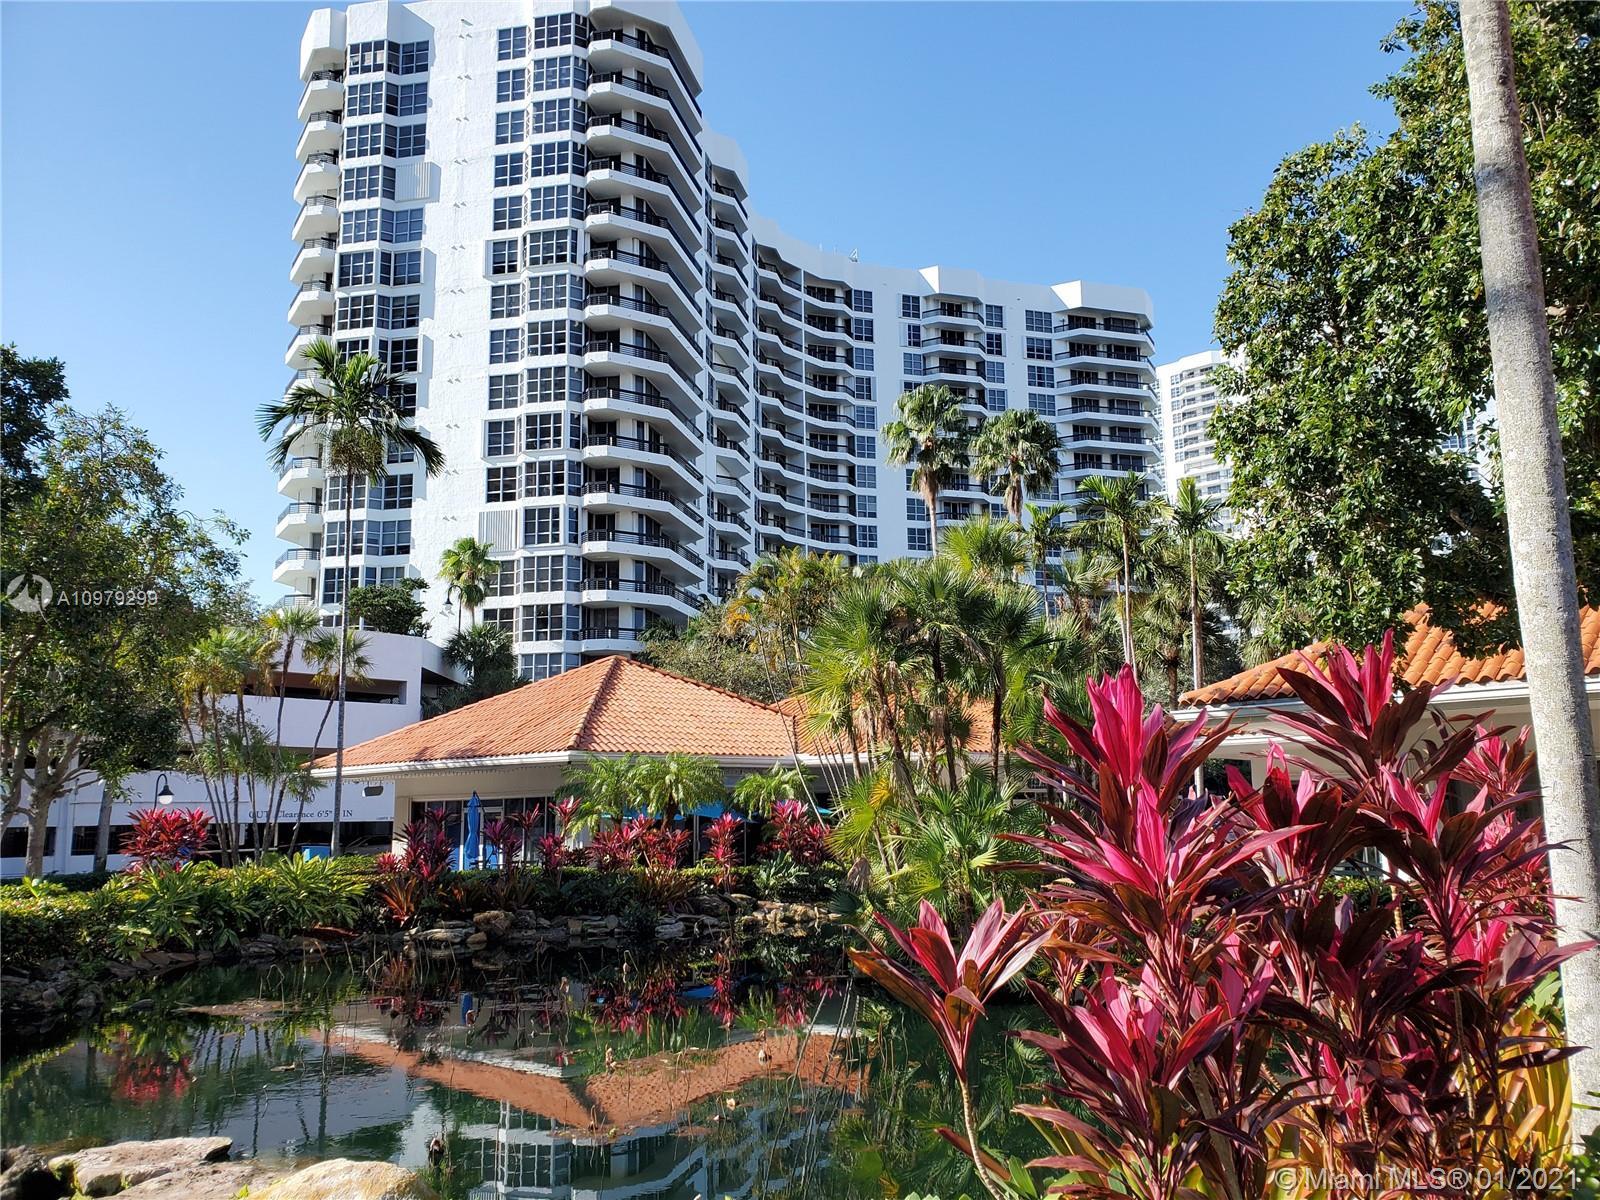 Photo of 3600 Mystic Pointe Dr #304, Aventura, Florida, 33180 - Lobby